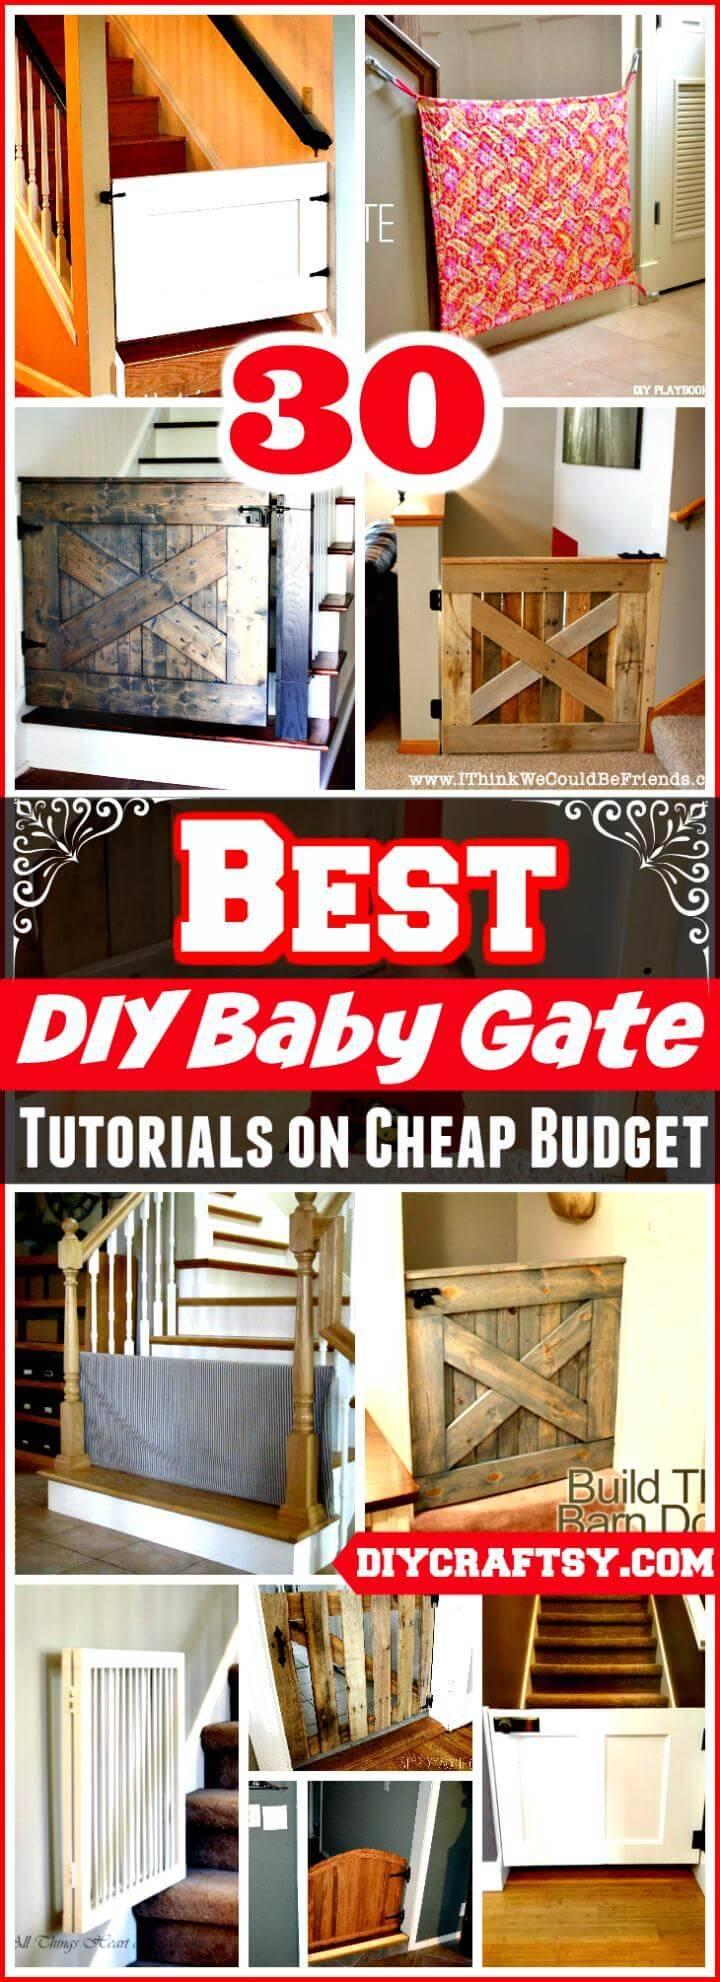 DIY Baby Gate